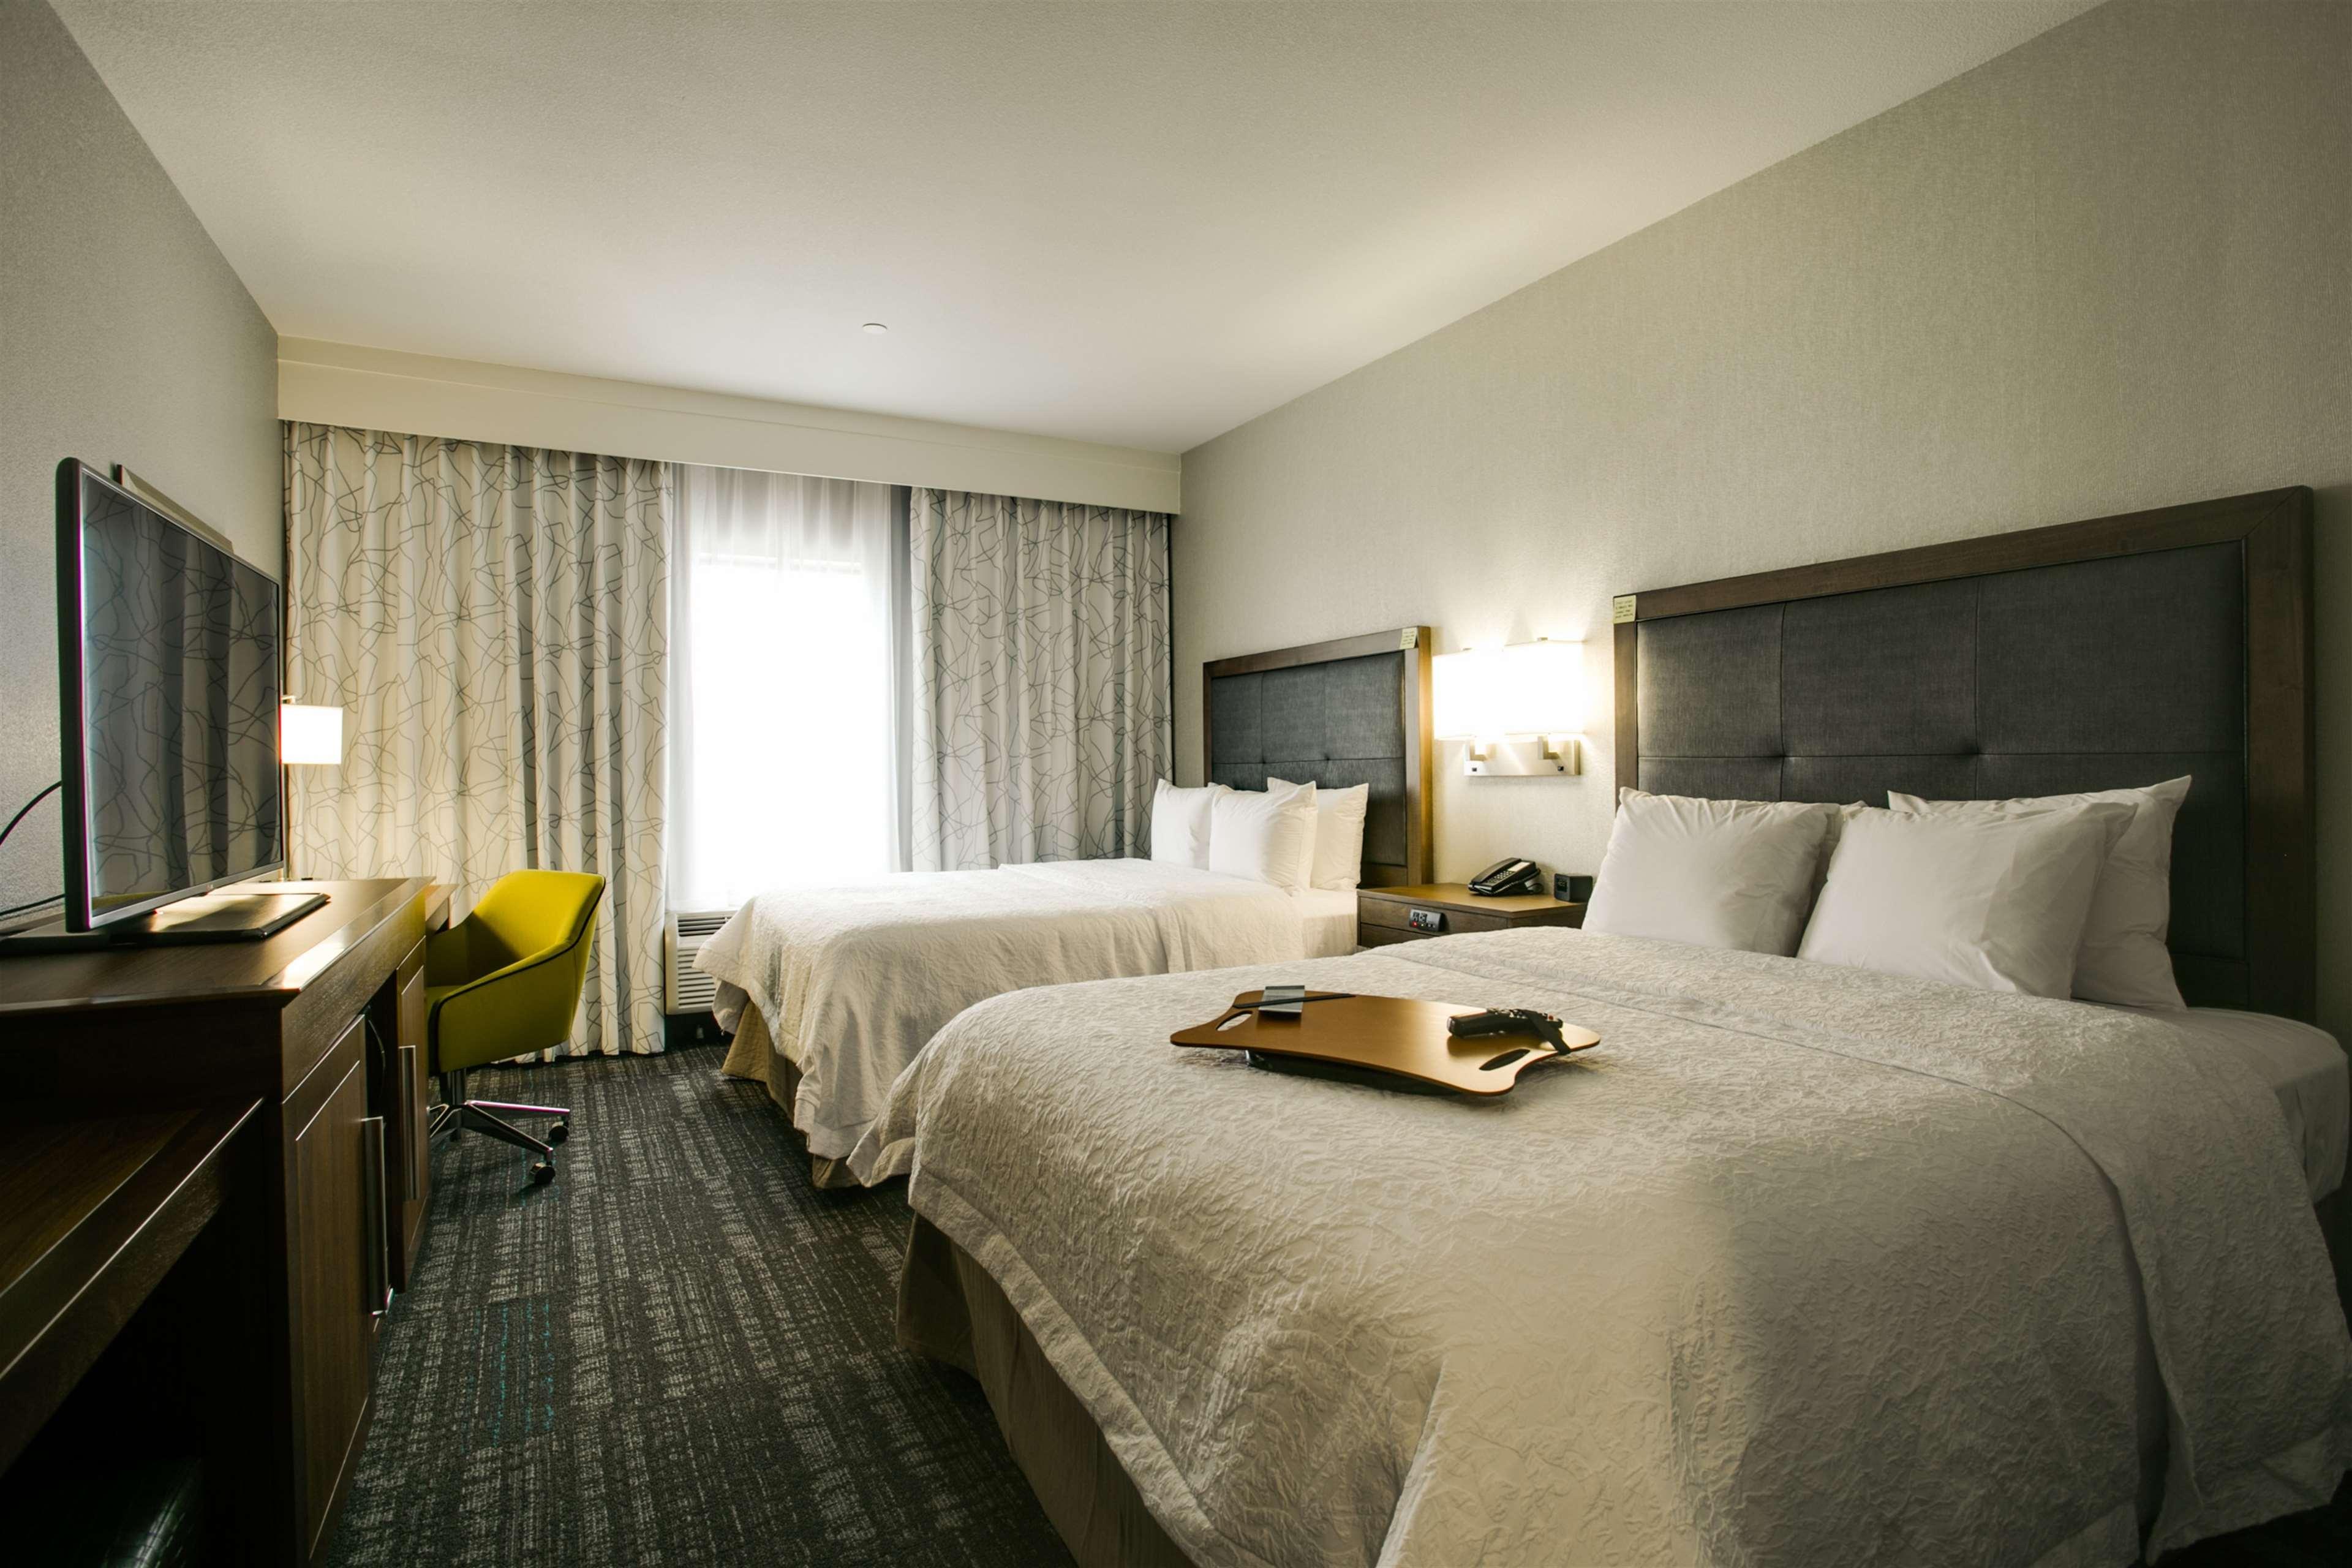 Hampton Inn & Suites Dallas/Ft. Worth Airport South image 29